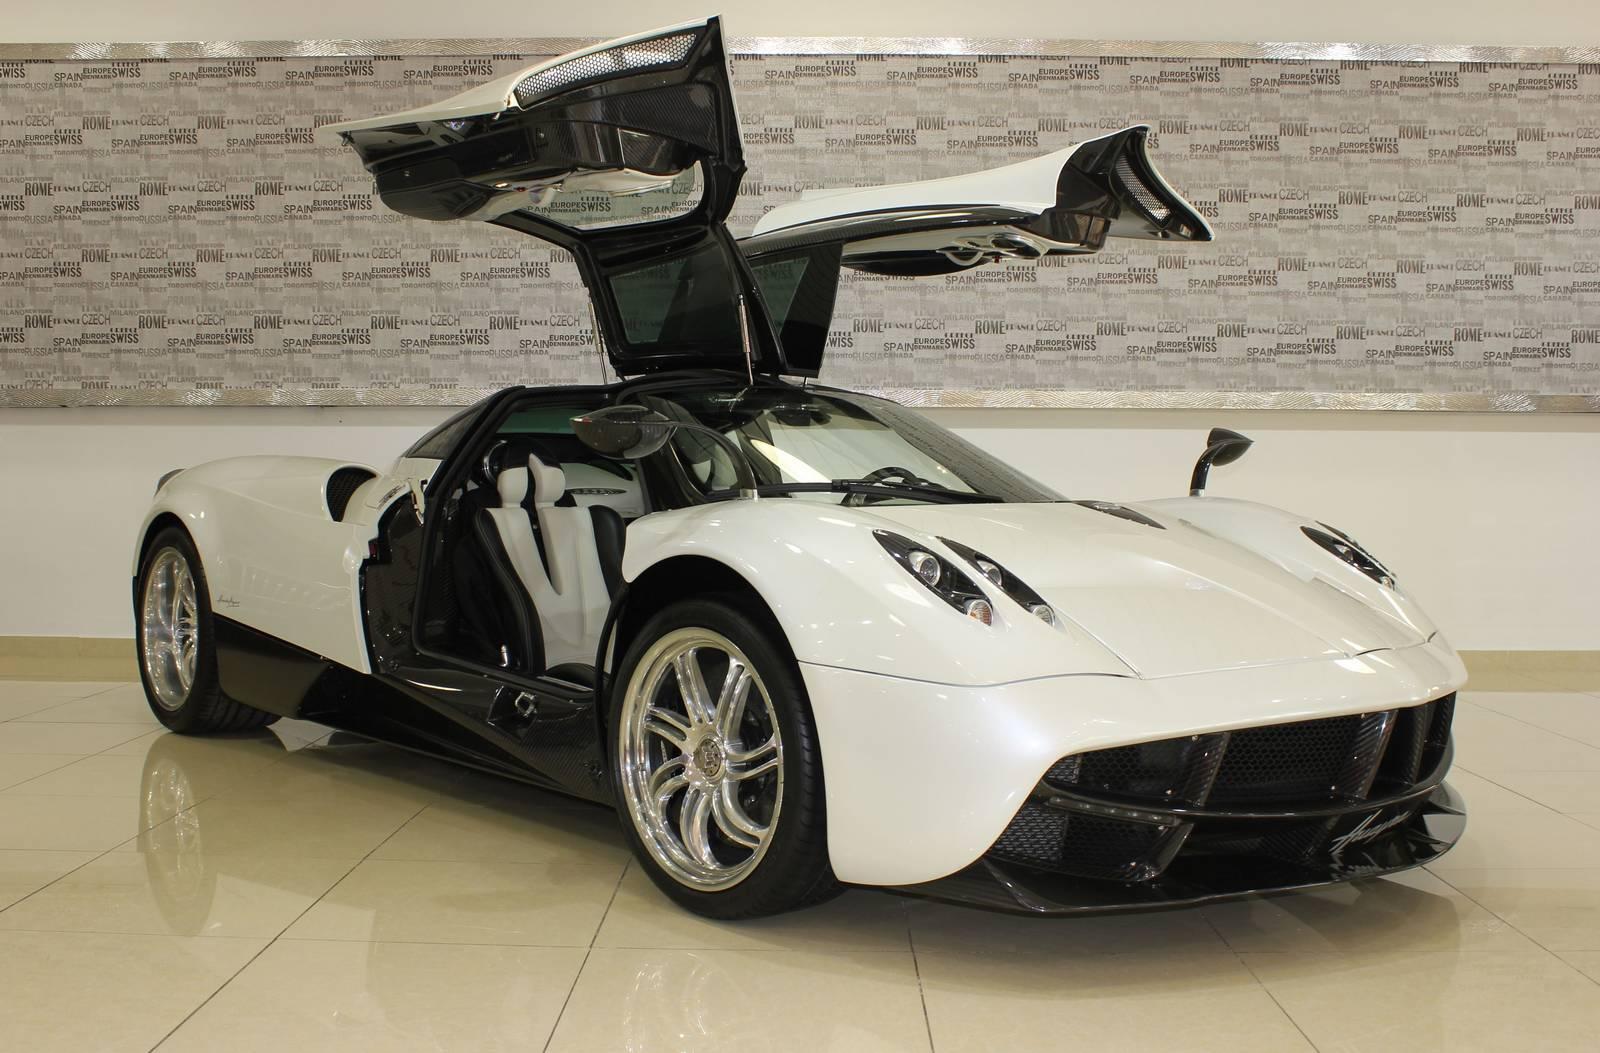 Pagani Huayra For Sale >> White And Carbon Fiber Pagani Huayra For Sale In Dubai Gtspirit